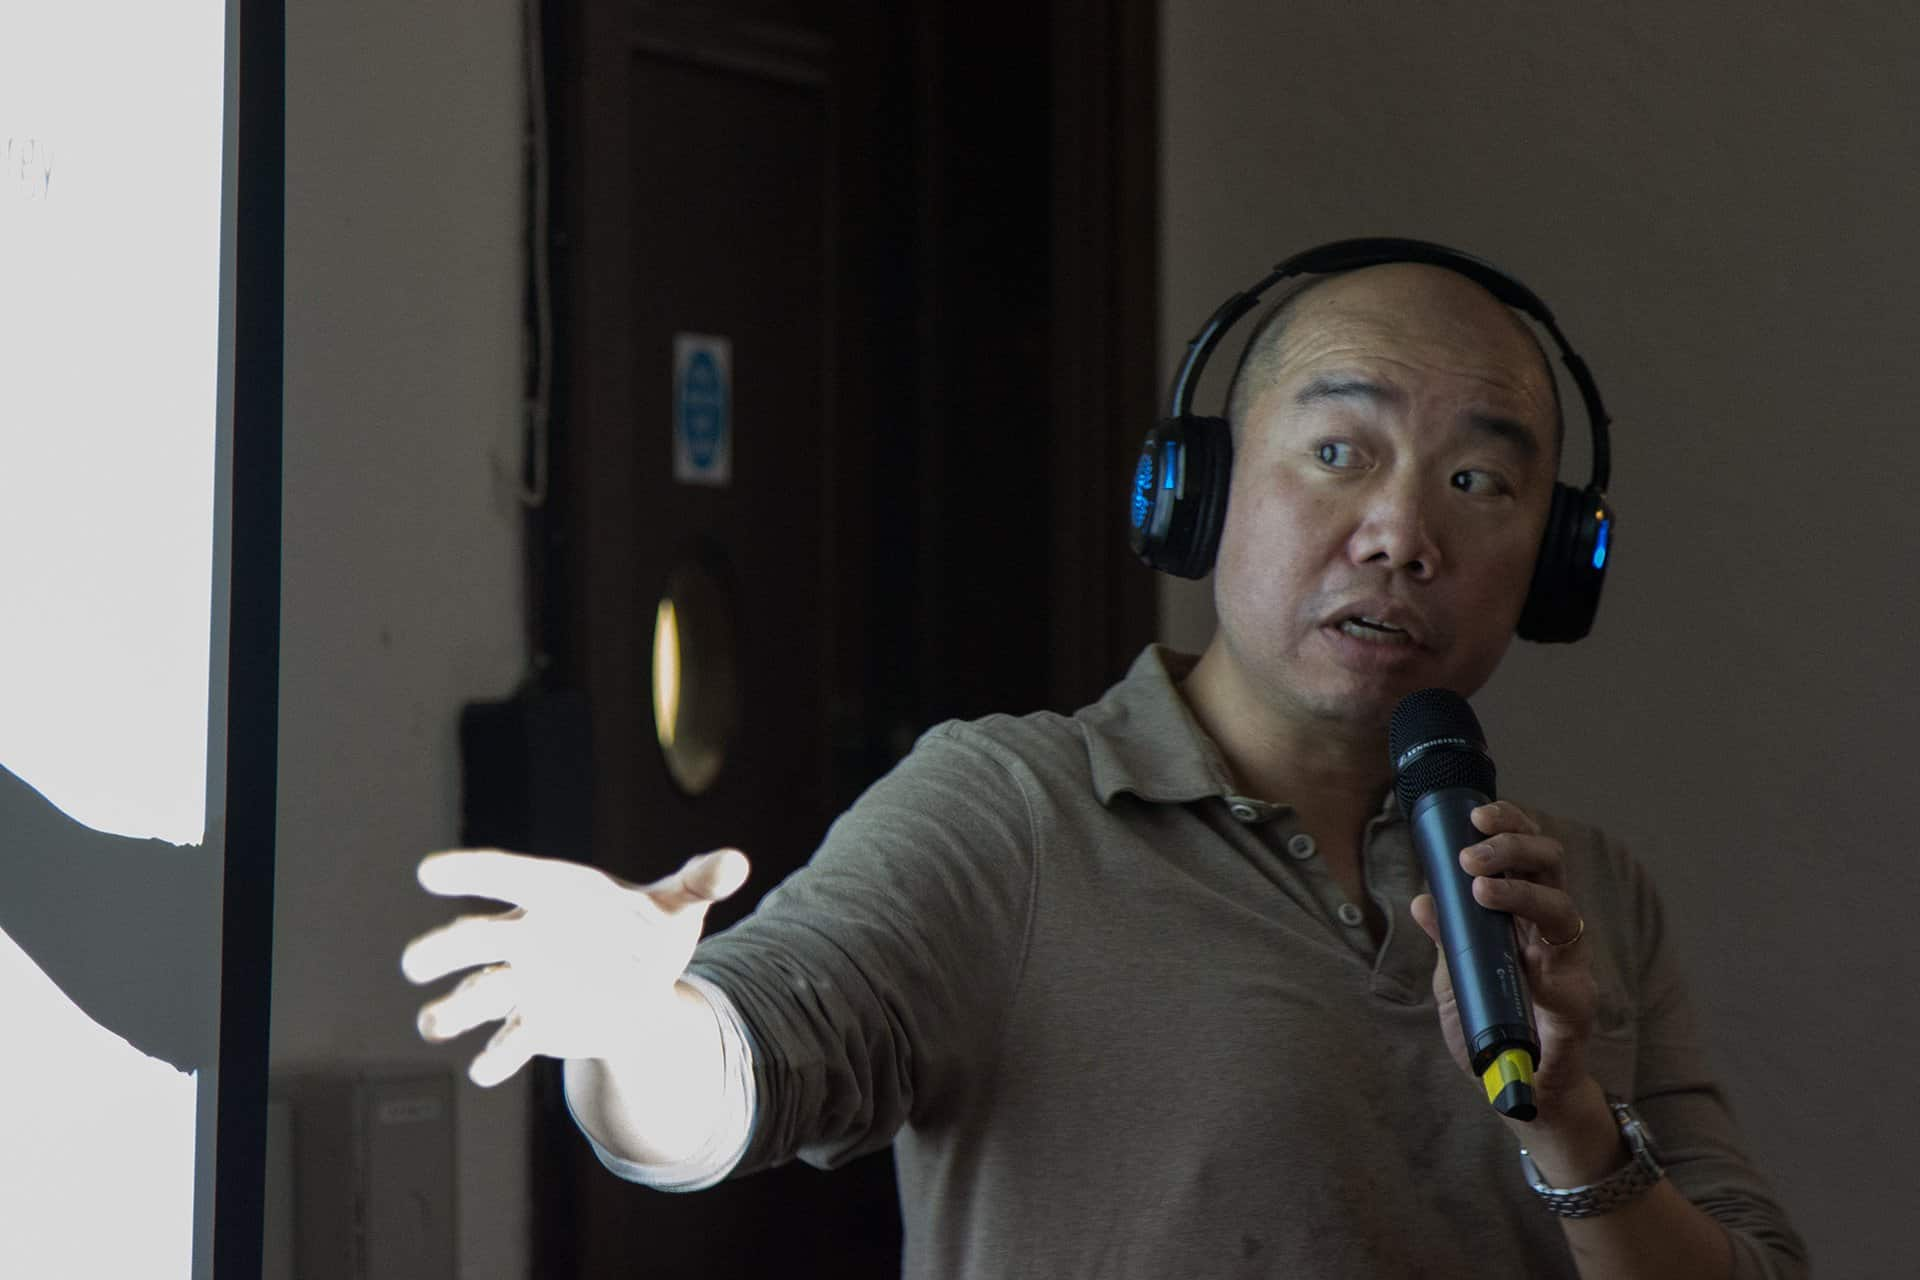 Cambridge's Dr. Giles Yeo give his presentation